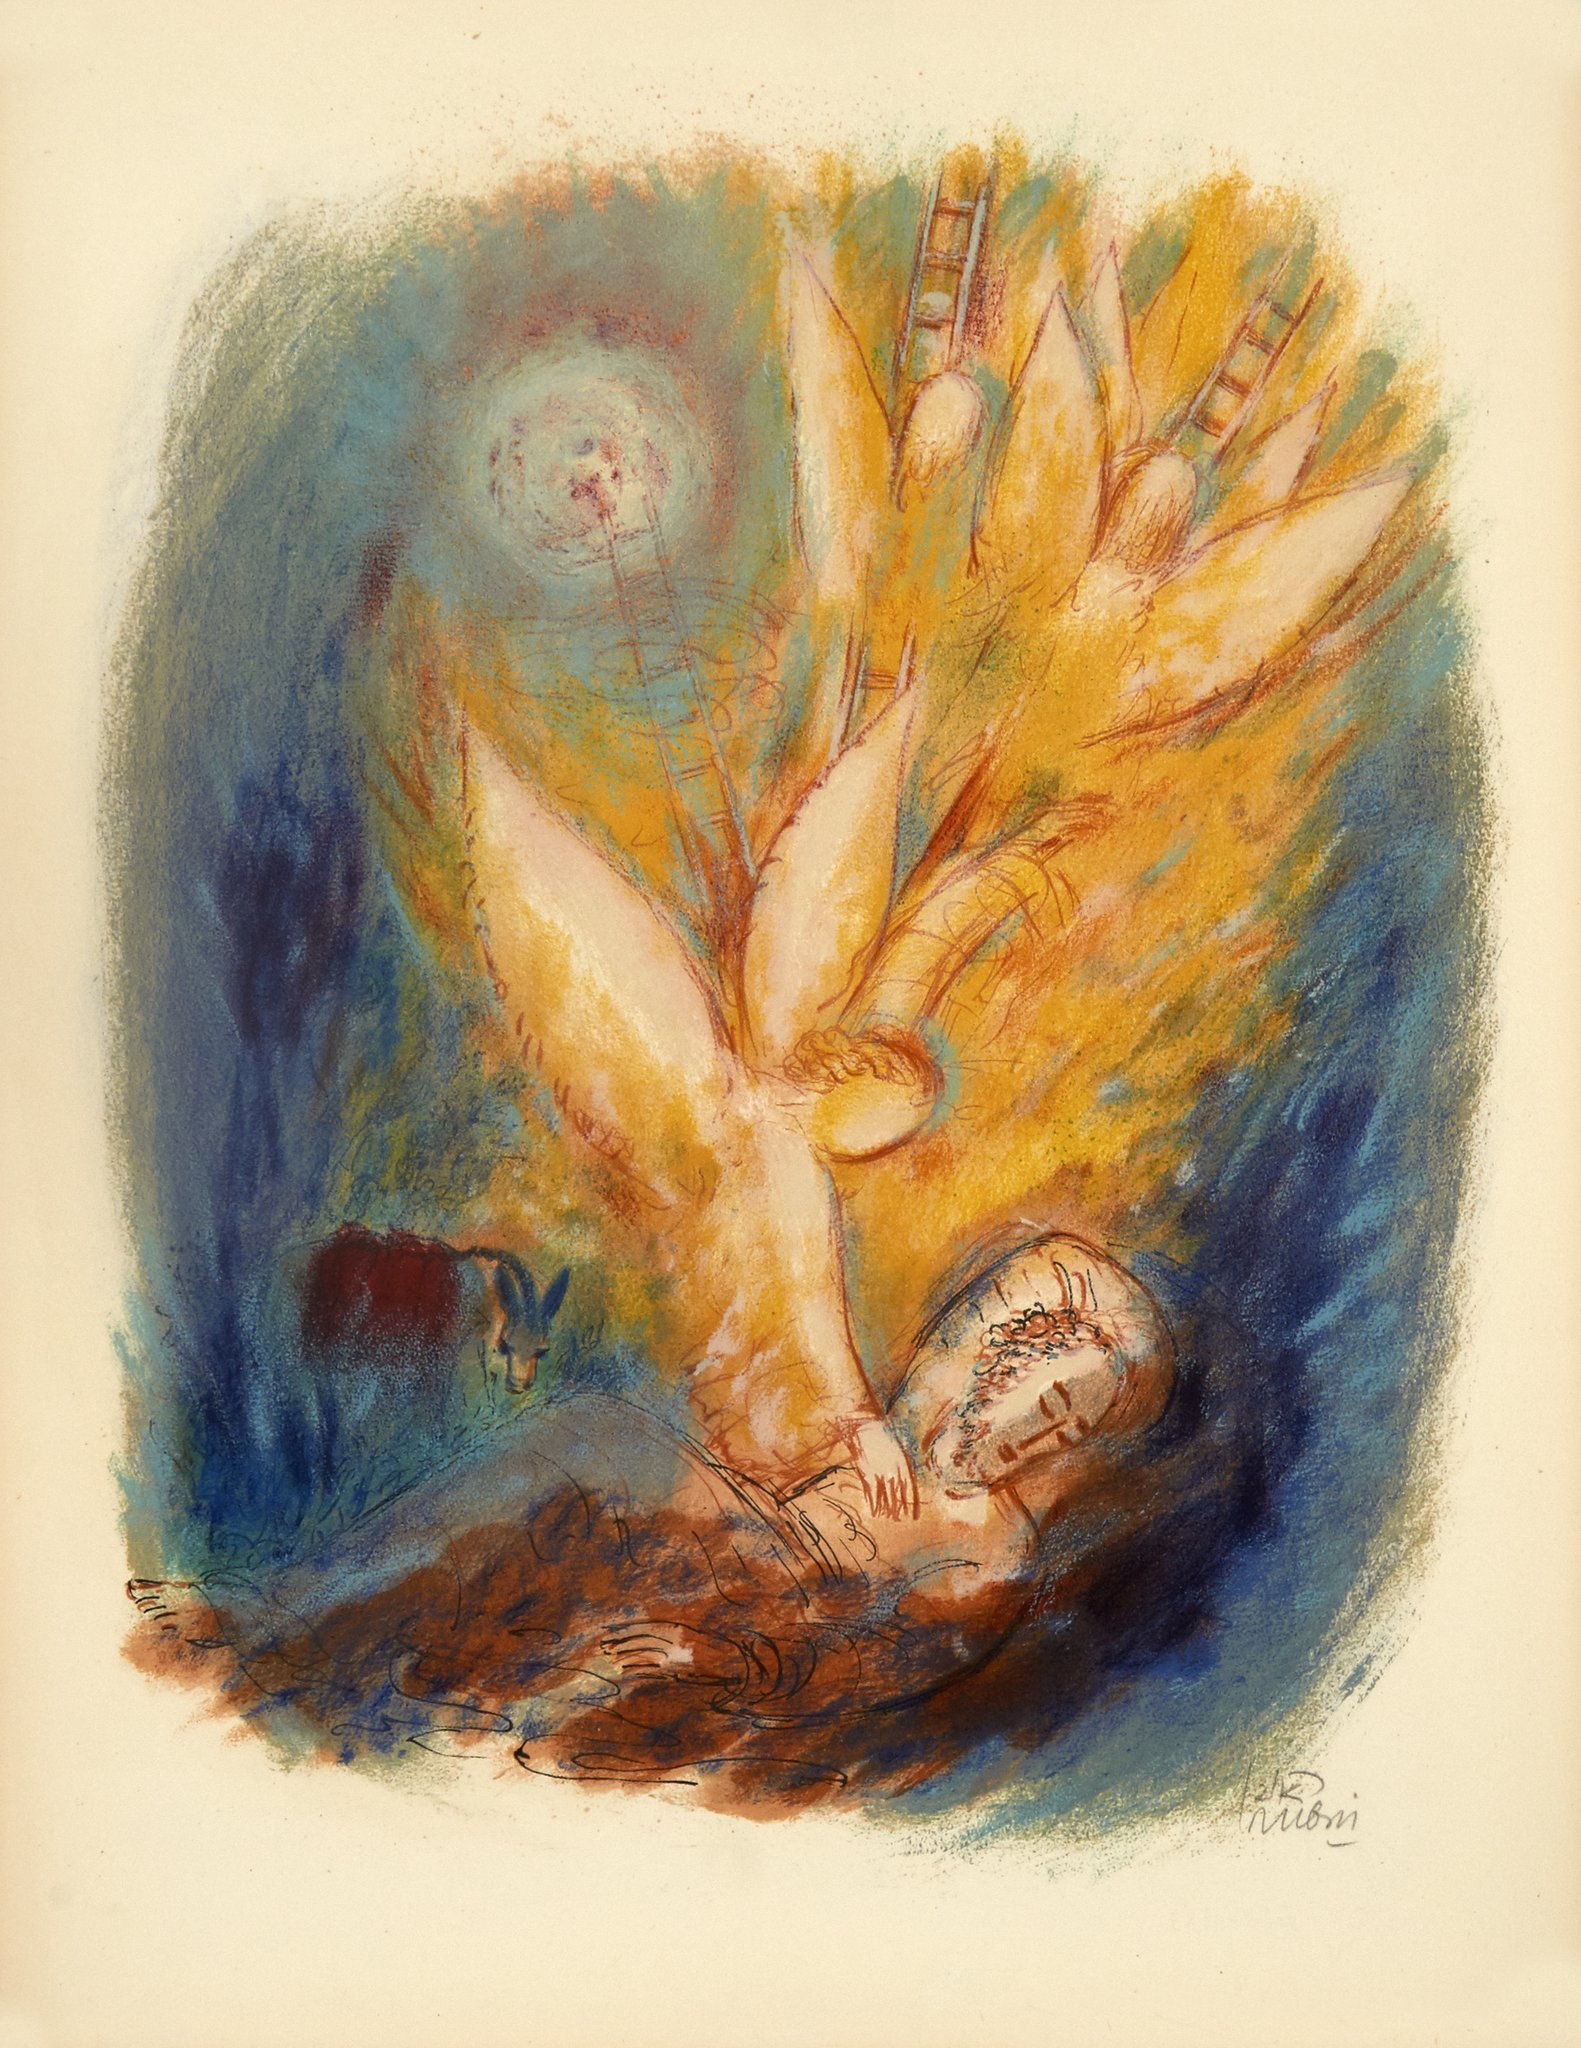 Jacob's Dream (Reuven Rubin)